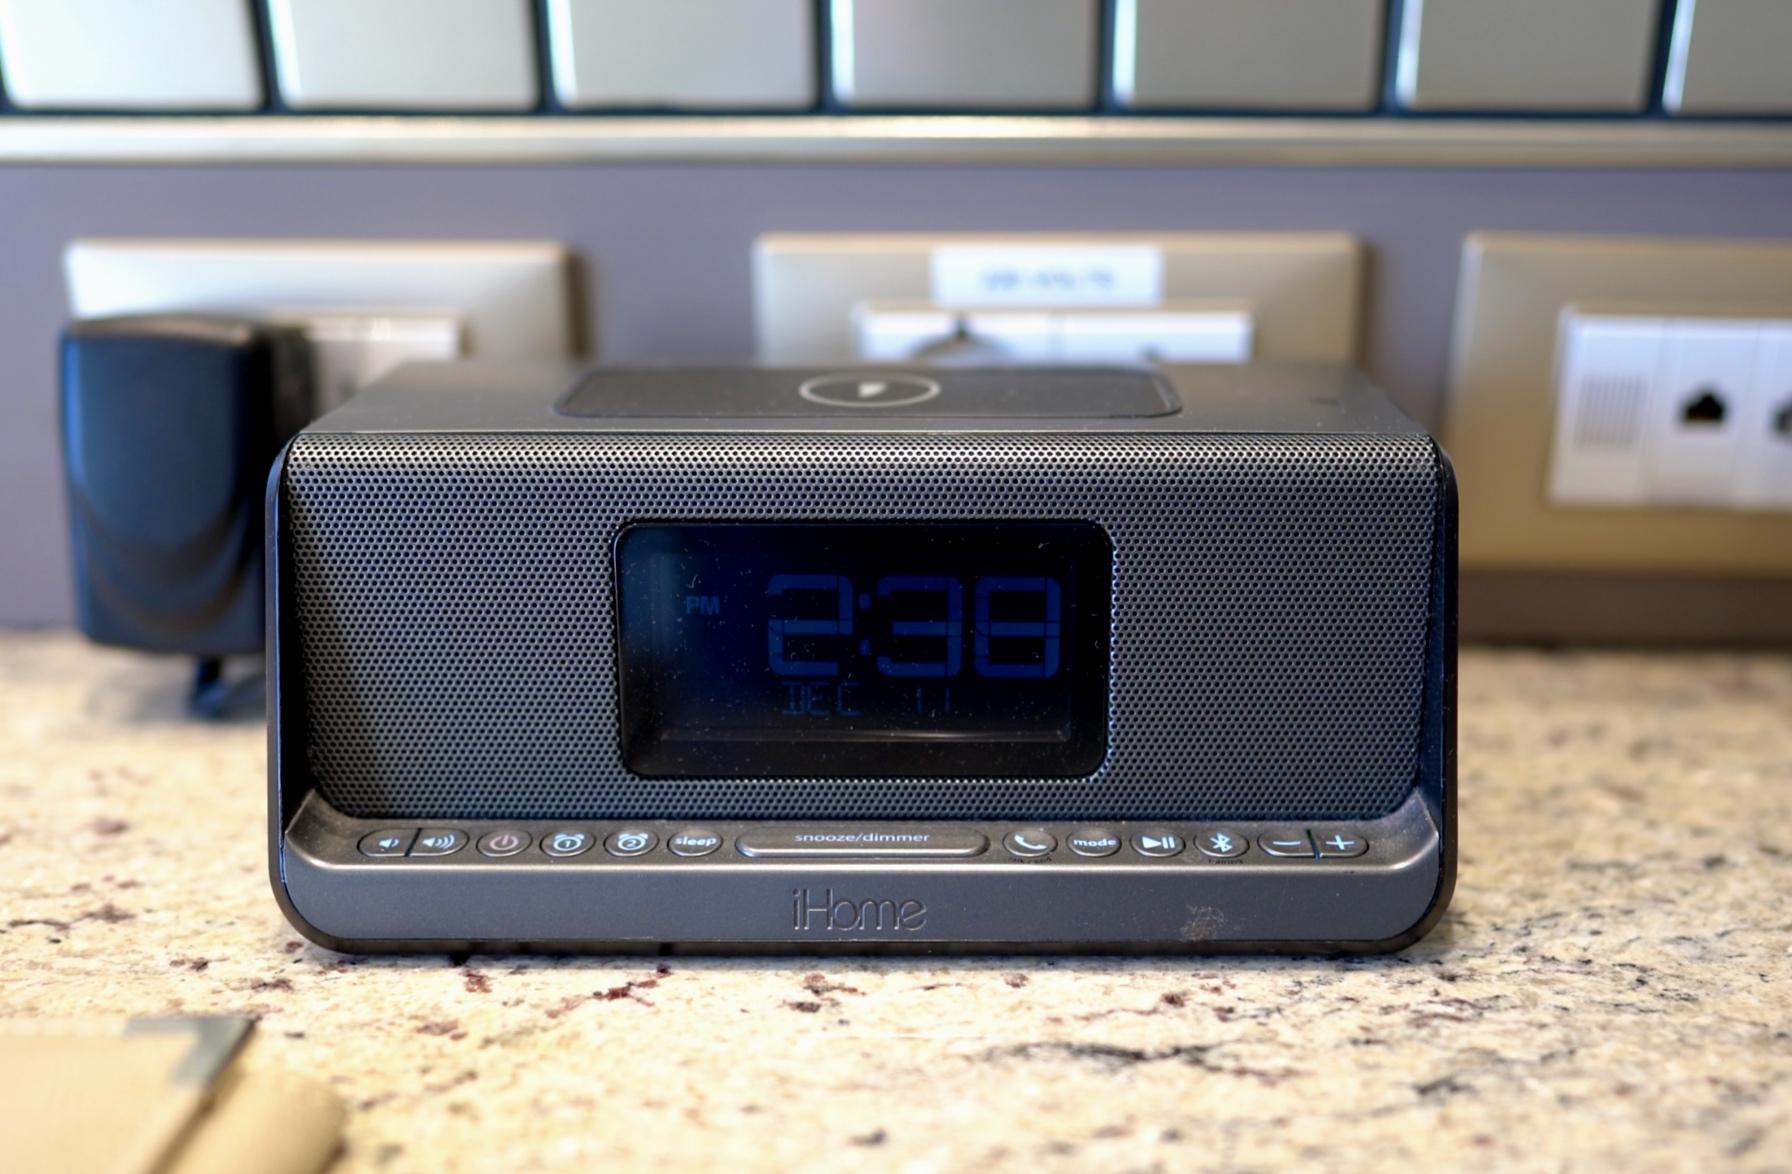 The charging station digital clock